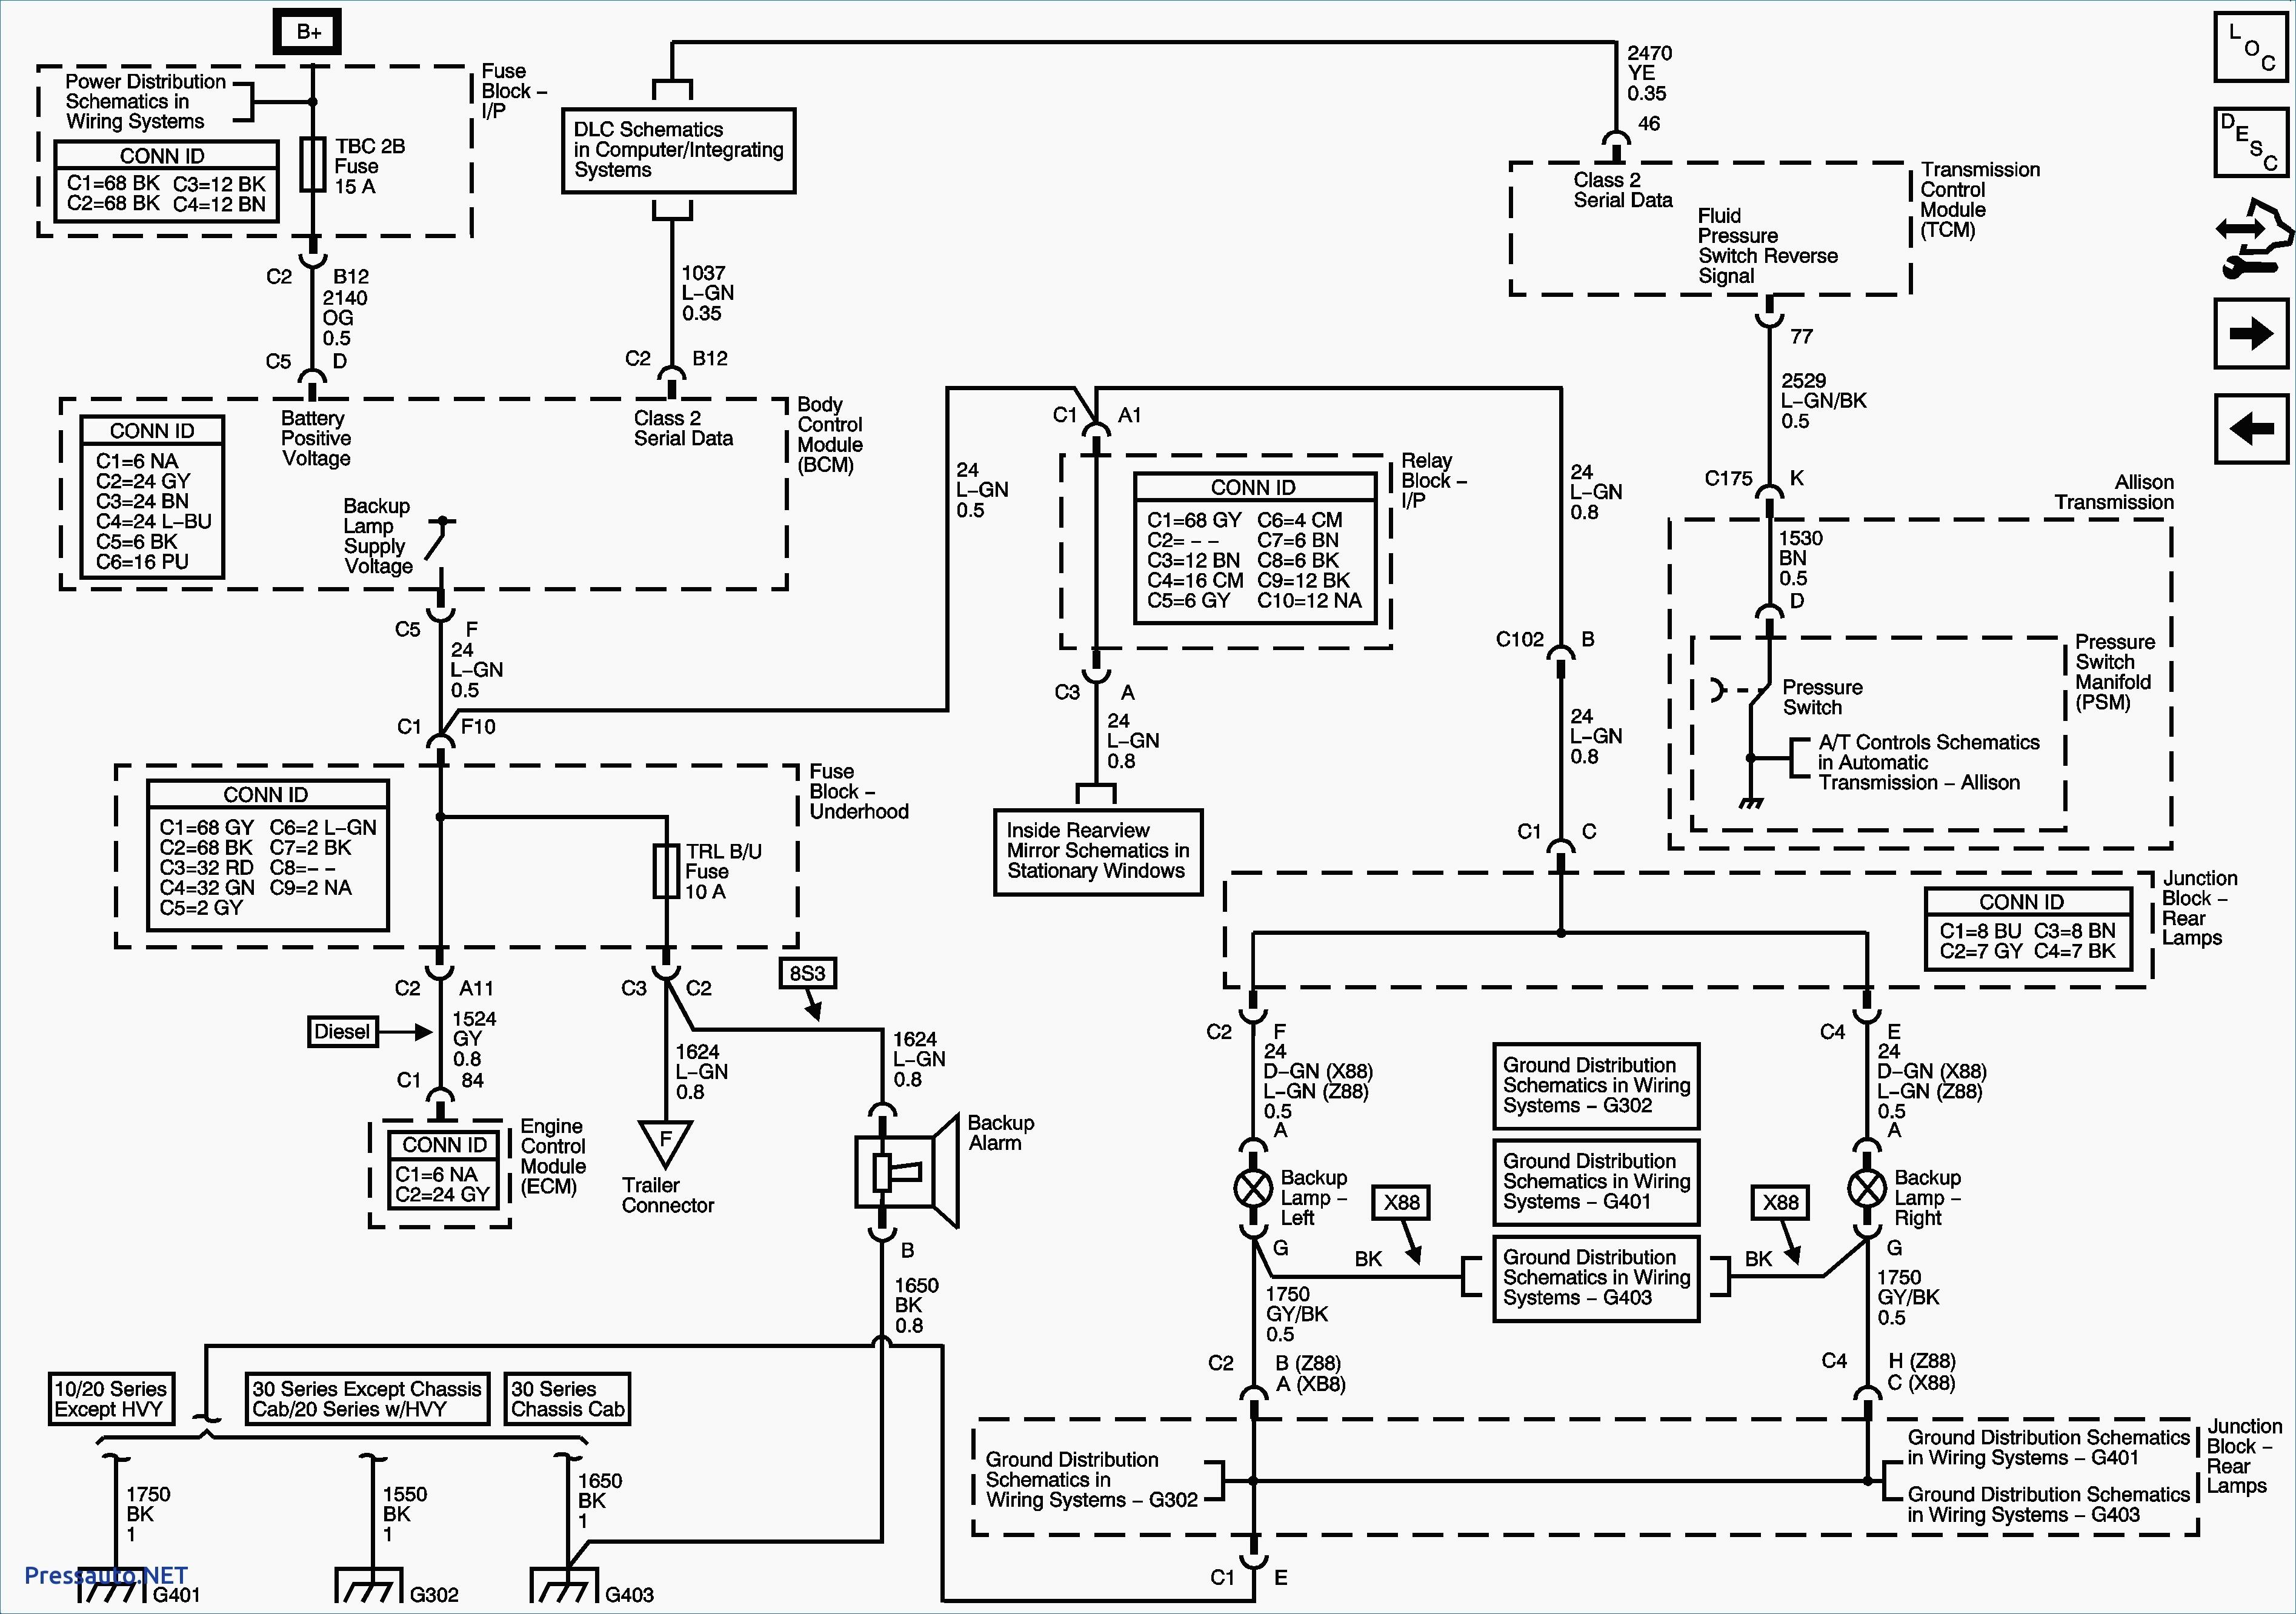 2008 Gmc Sierra Wiring Diagram 2006 Gmc Sierra Wiring Diagram Wiring Data Of 2008 Gmc Sierra Wiring Diagram